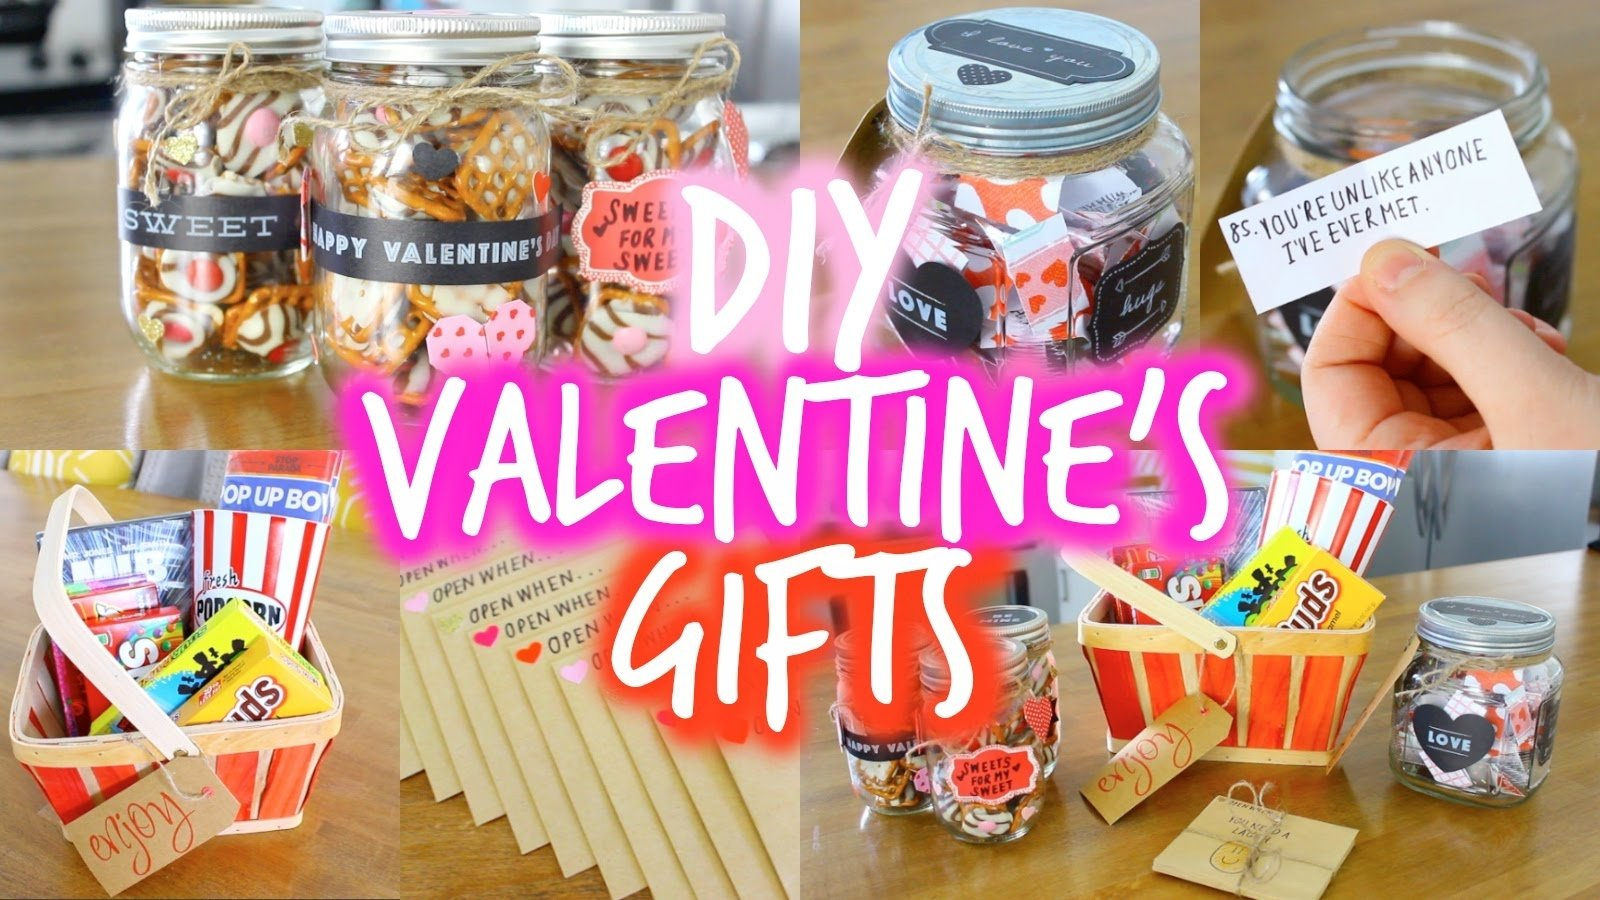 easy diy valentine's day gift ideas for your boyfriend! - youtube